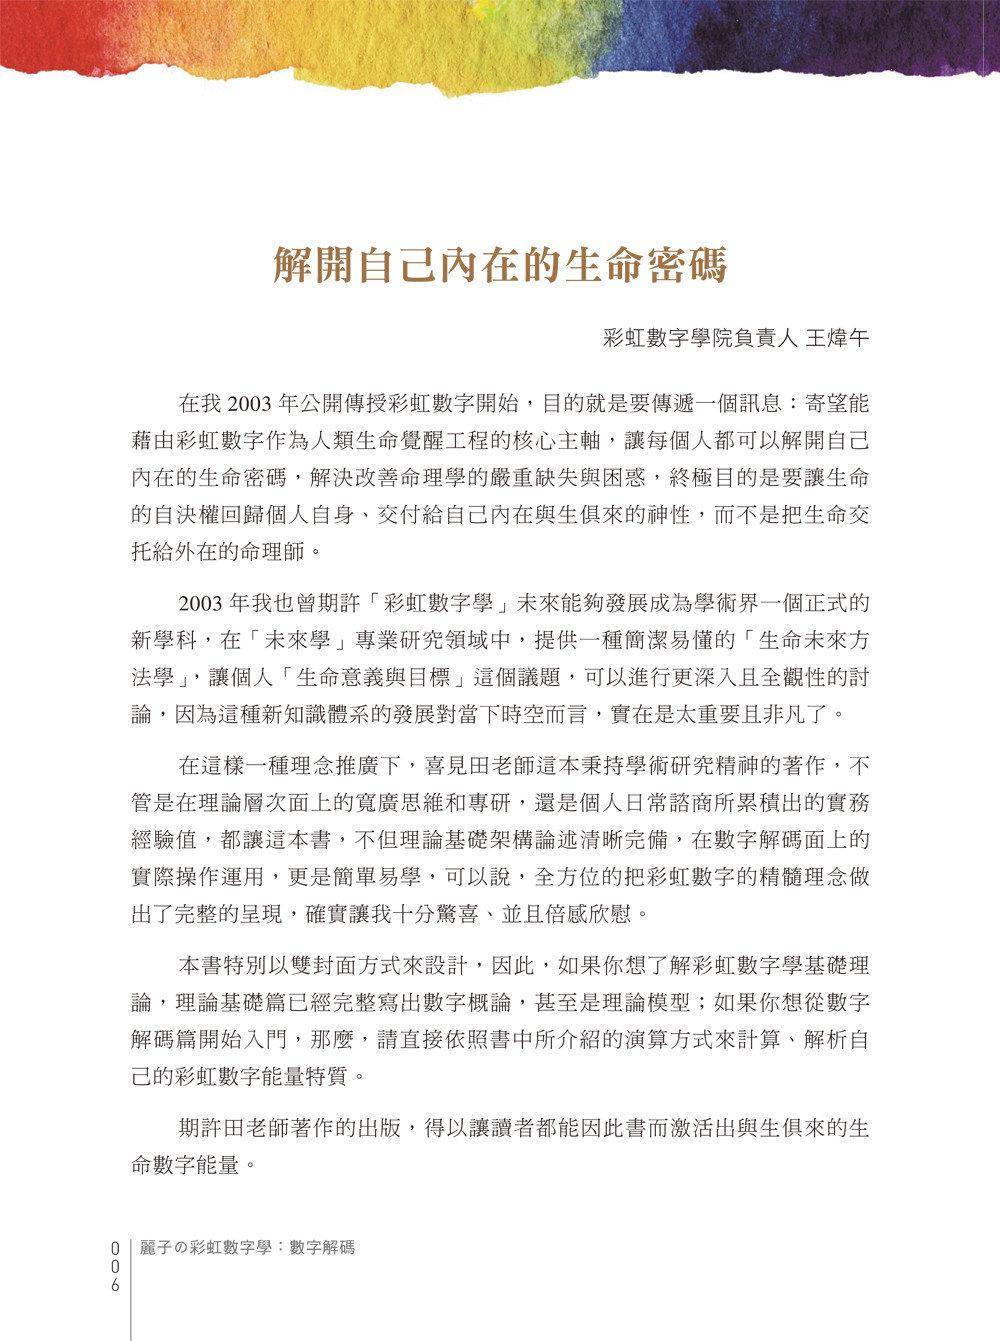 麗子の彩虹數字學:數字解碼與理論基礎-preview-6